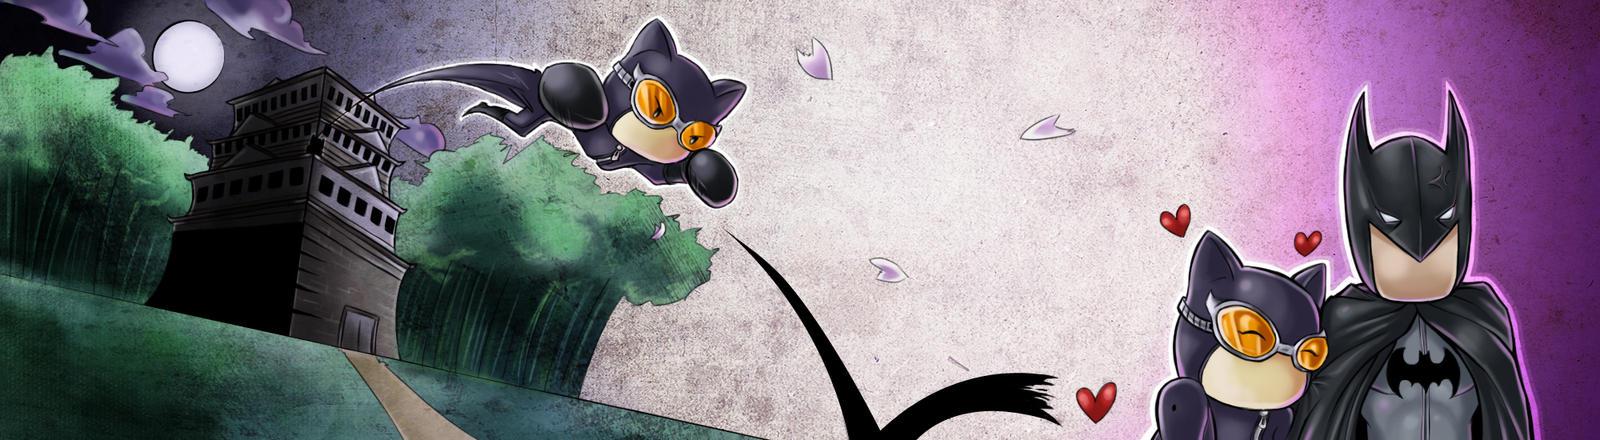 Ninja Kitty Cuddle by JaeBlaze06